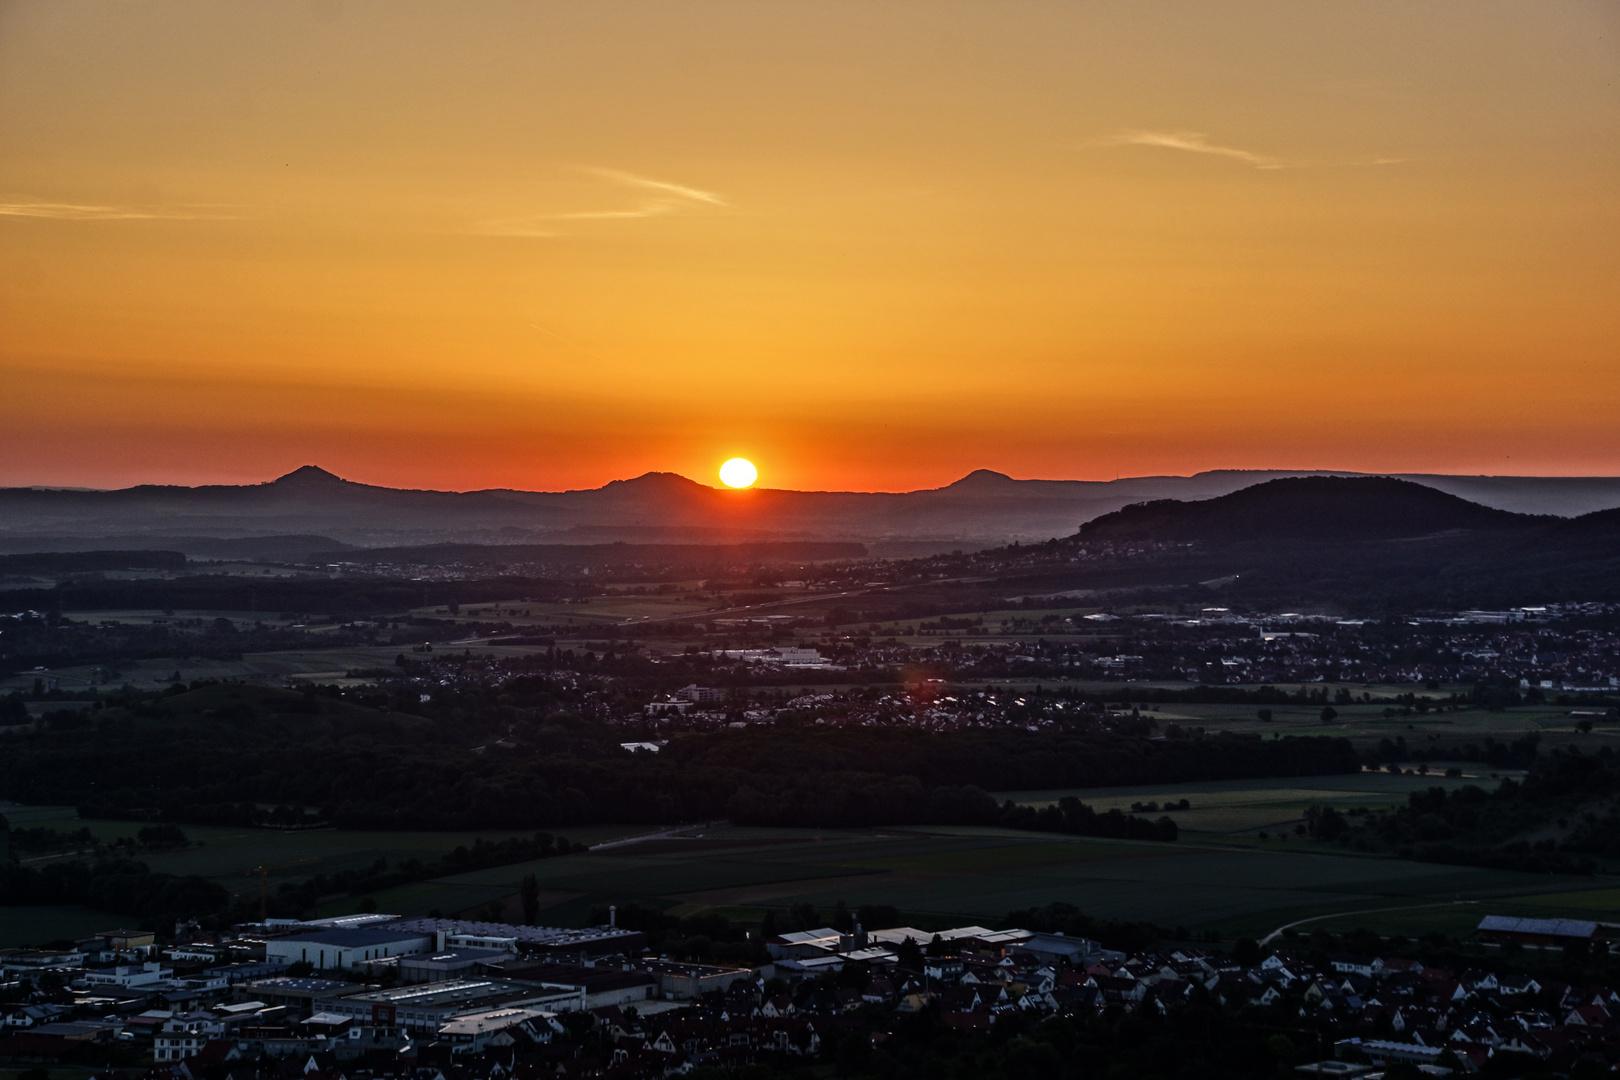 Sonnenaufgang über dem Rechberg (2)